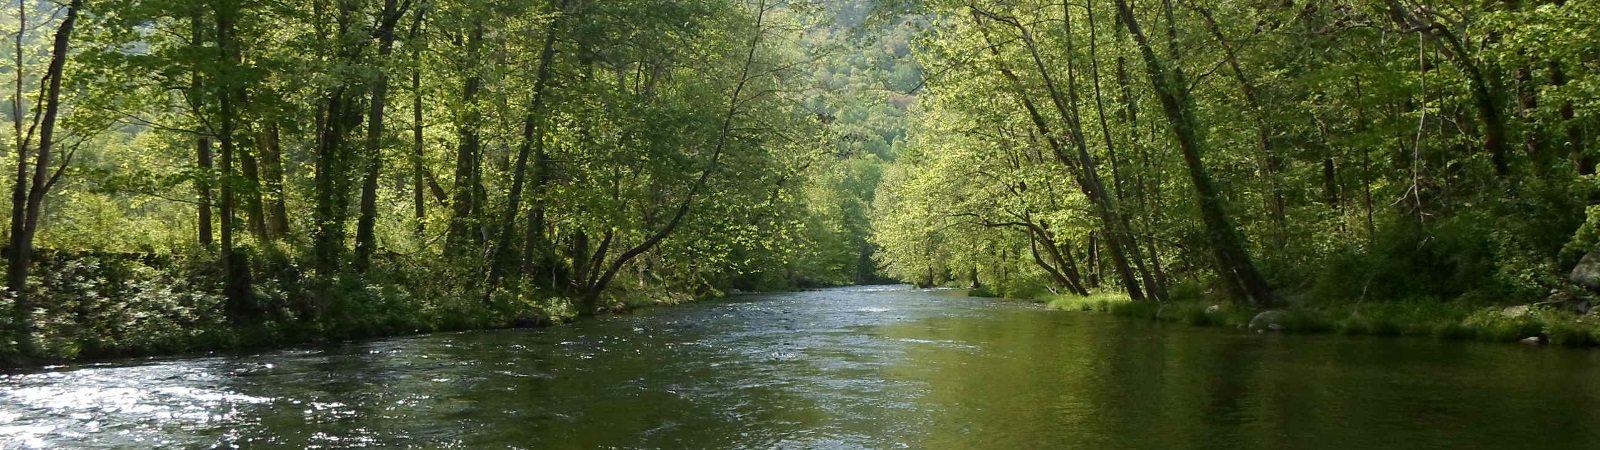 nantahala river weather